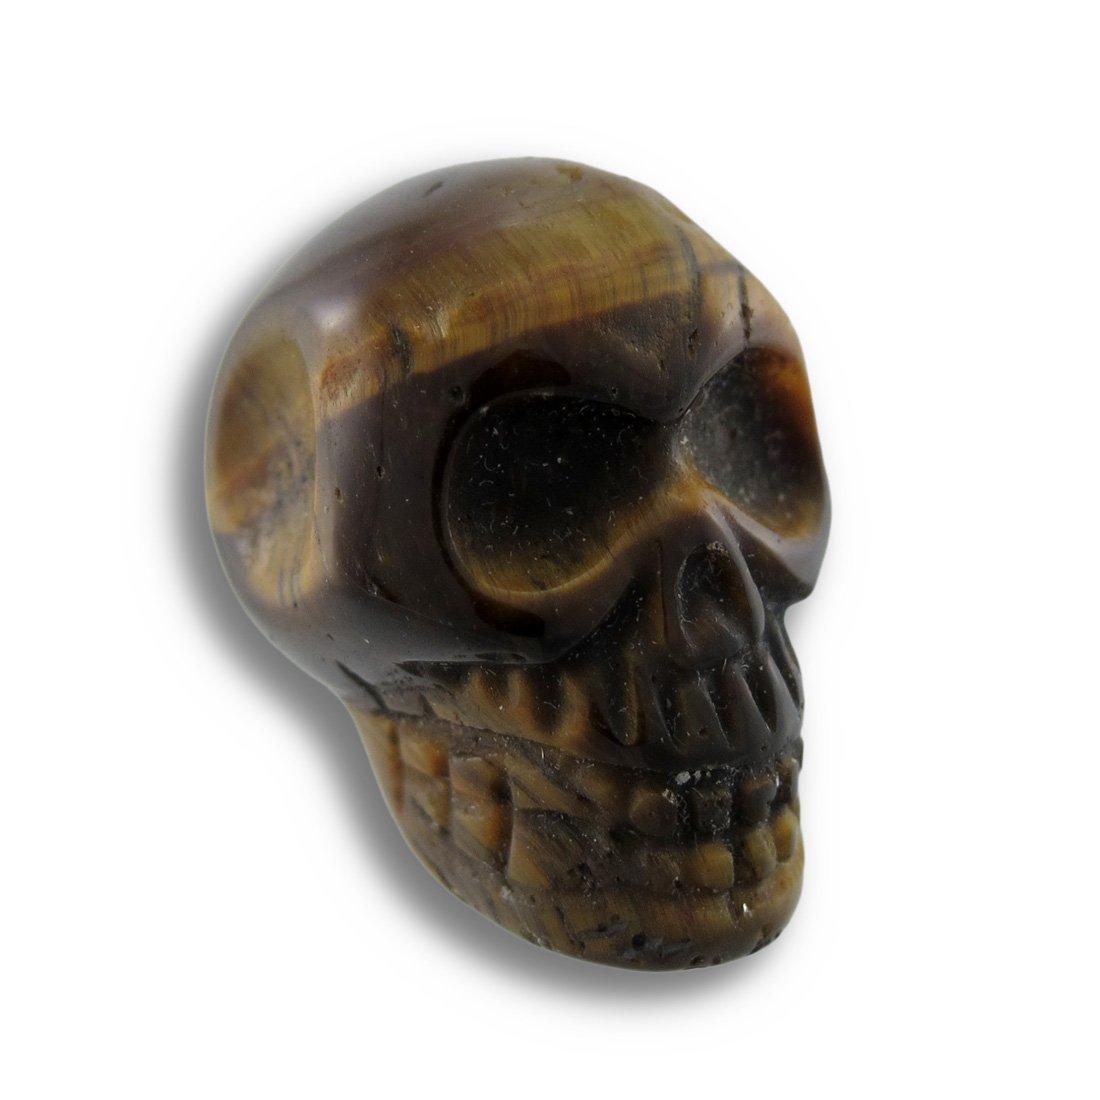 things2die4アクリルLoose宝石美しいCarved Tiger Eye Gemstone Skull 25 mm 1インチブラウンモデル# vil33 a   B00GCAOO4U